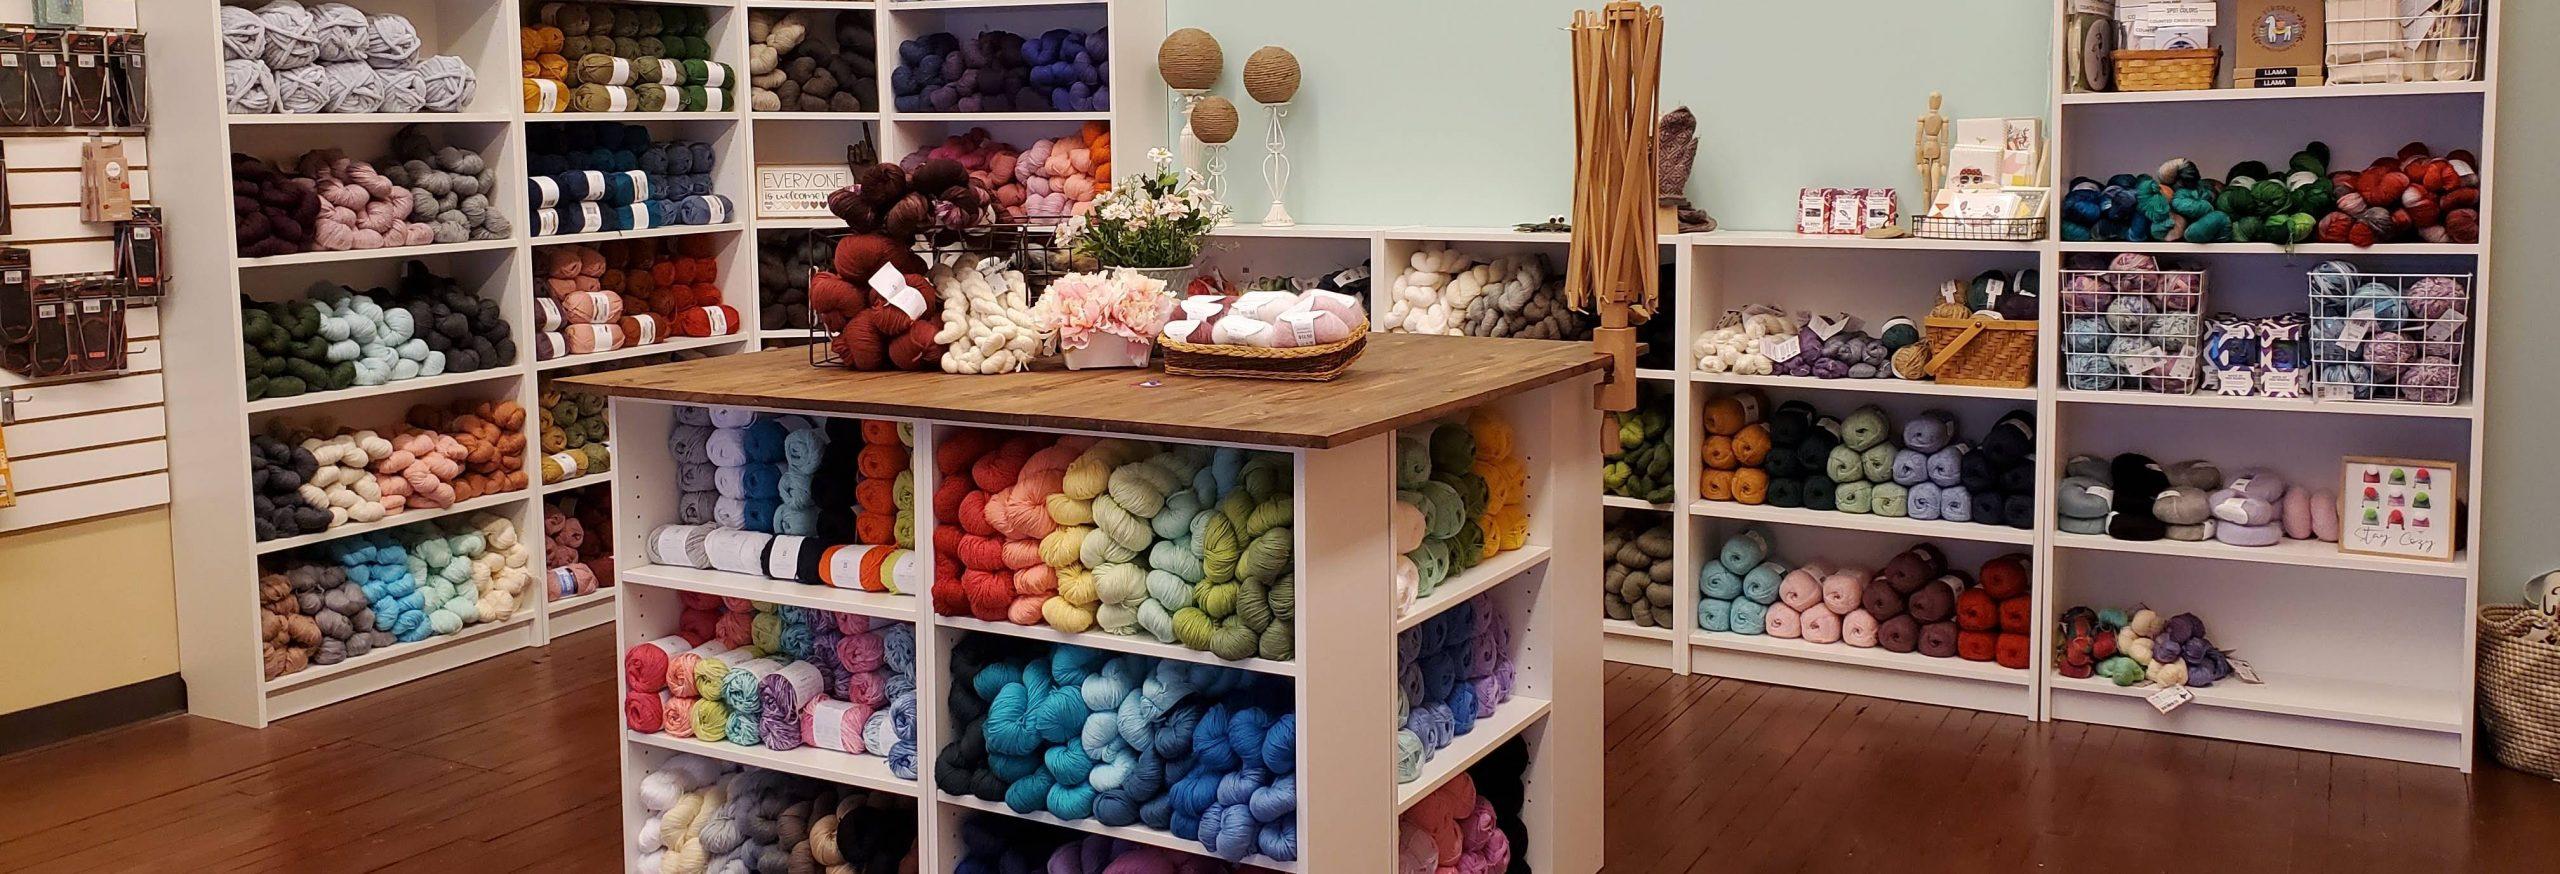 Image of inside of yarn shop